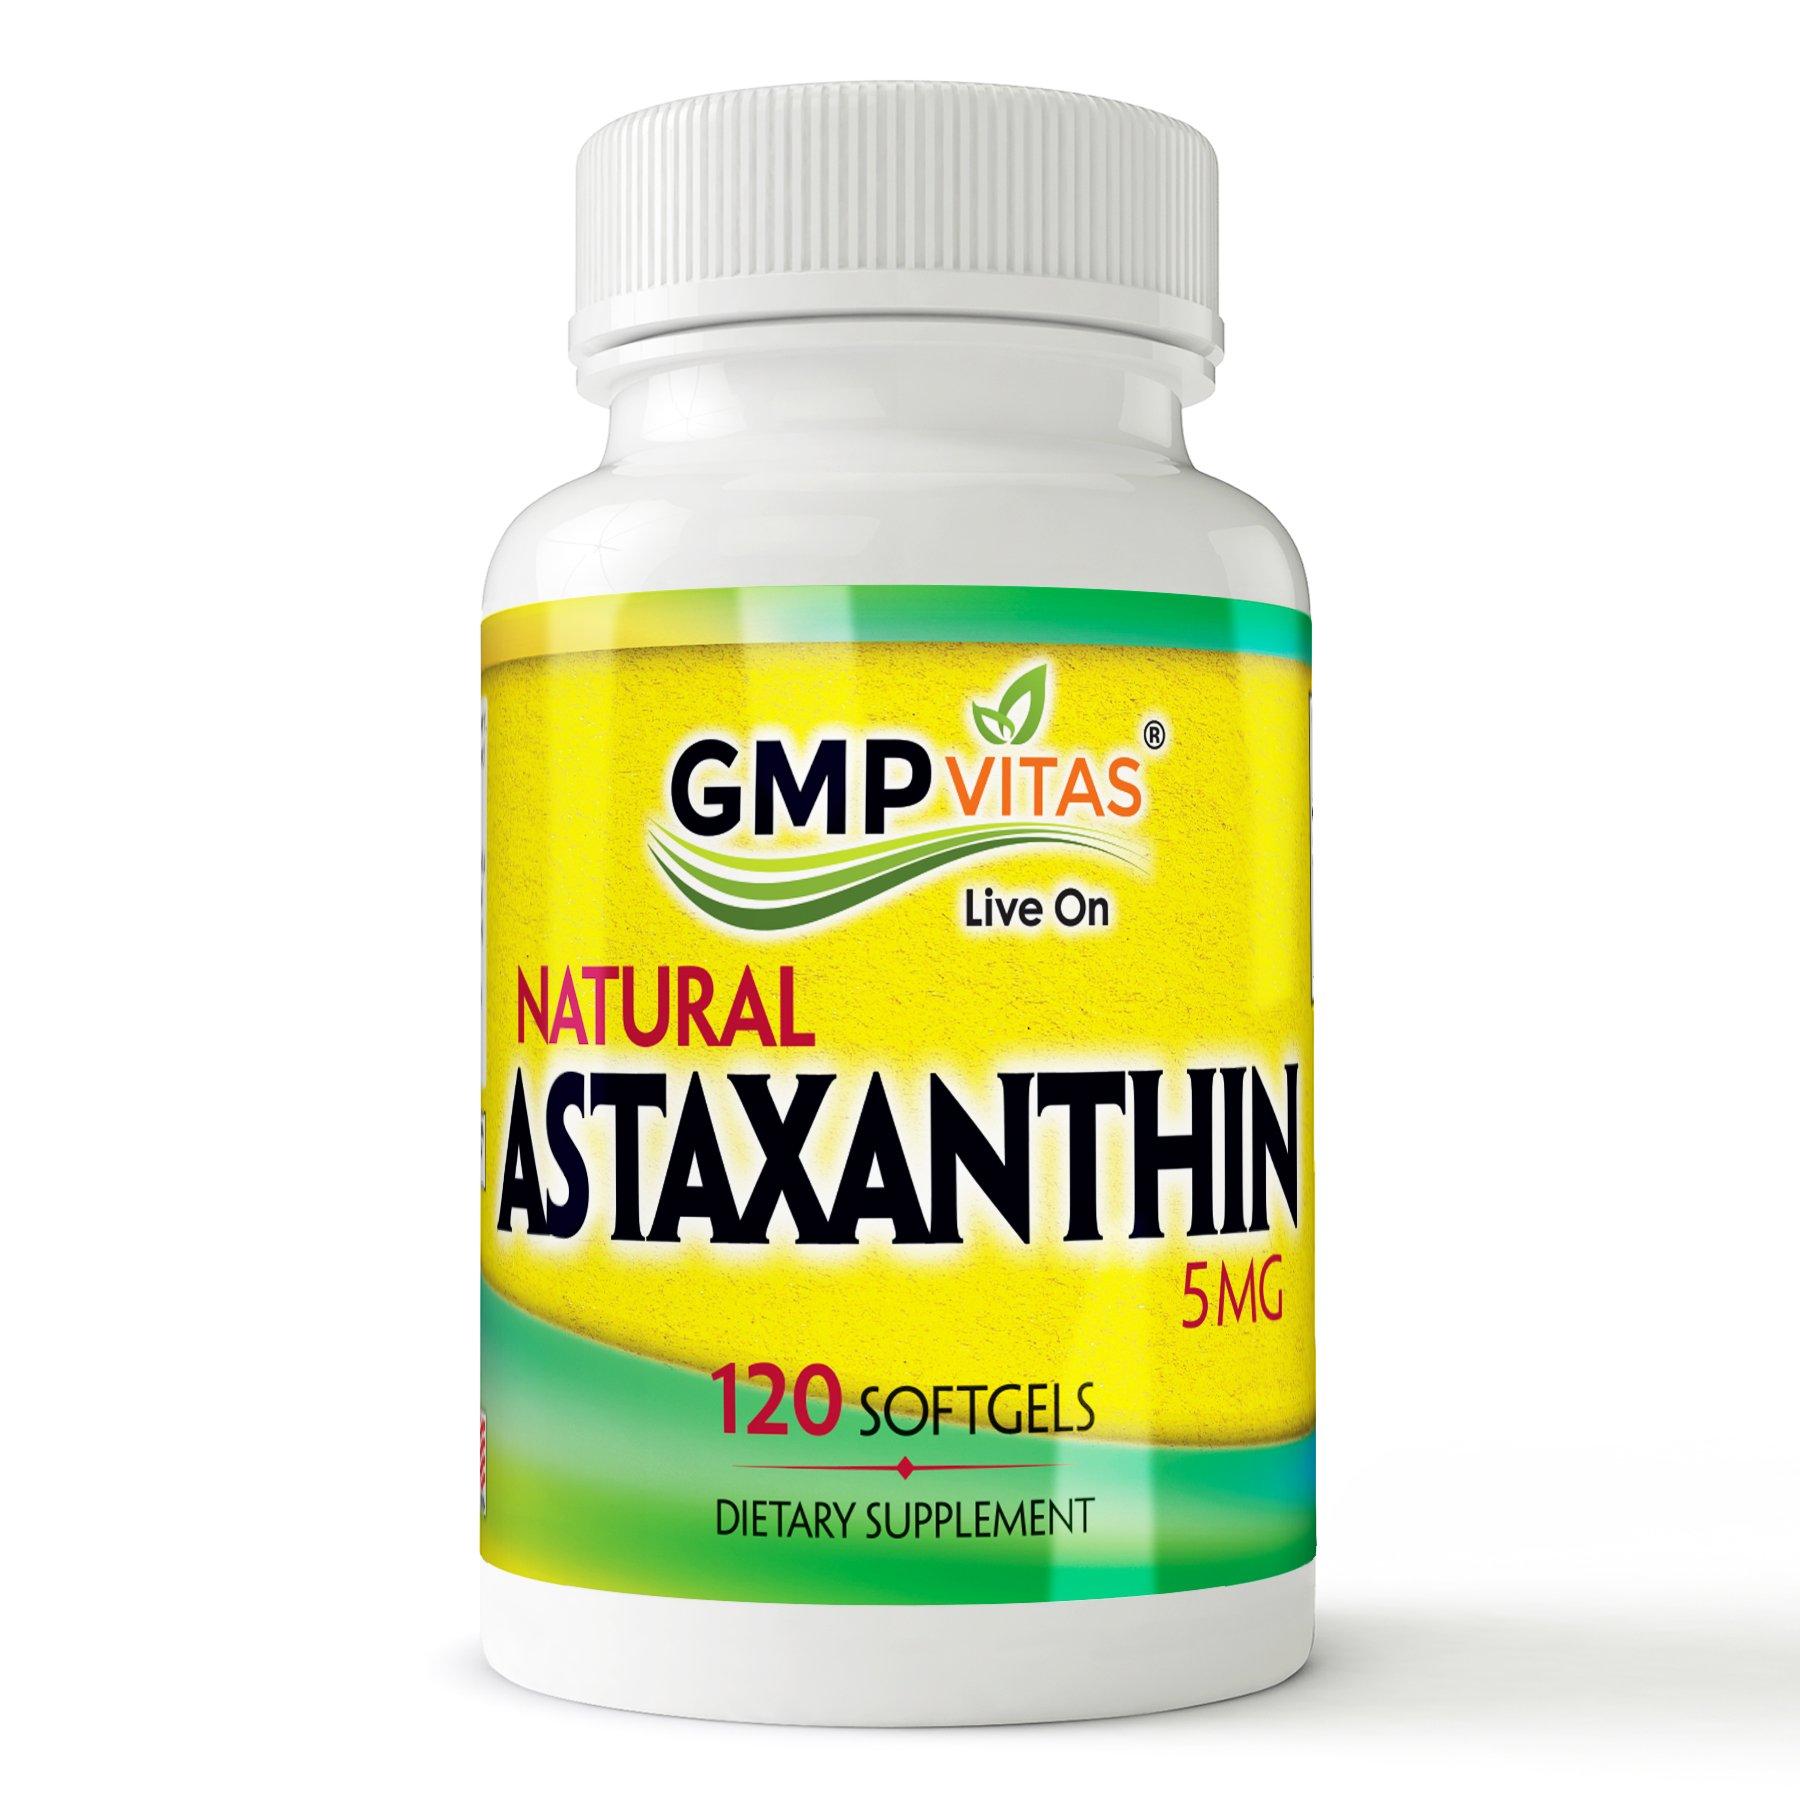 GMP vitas Natural Astaxanthin 5 MG, 120 Softgels, Dietary Supplement